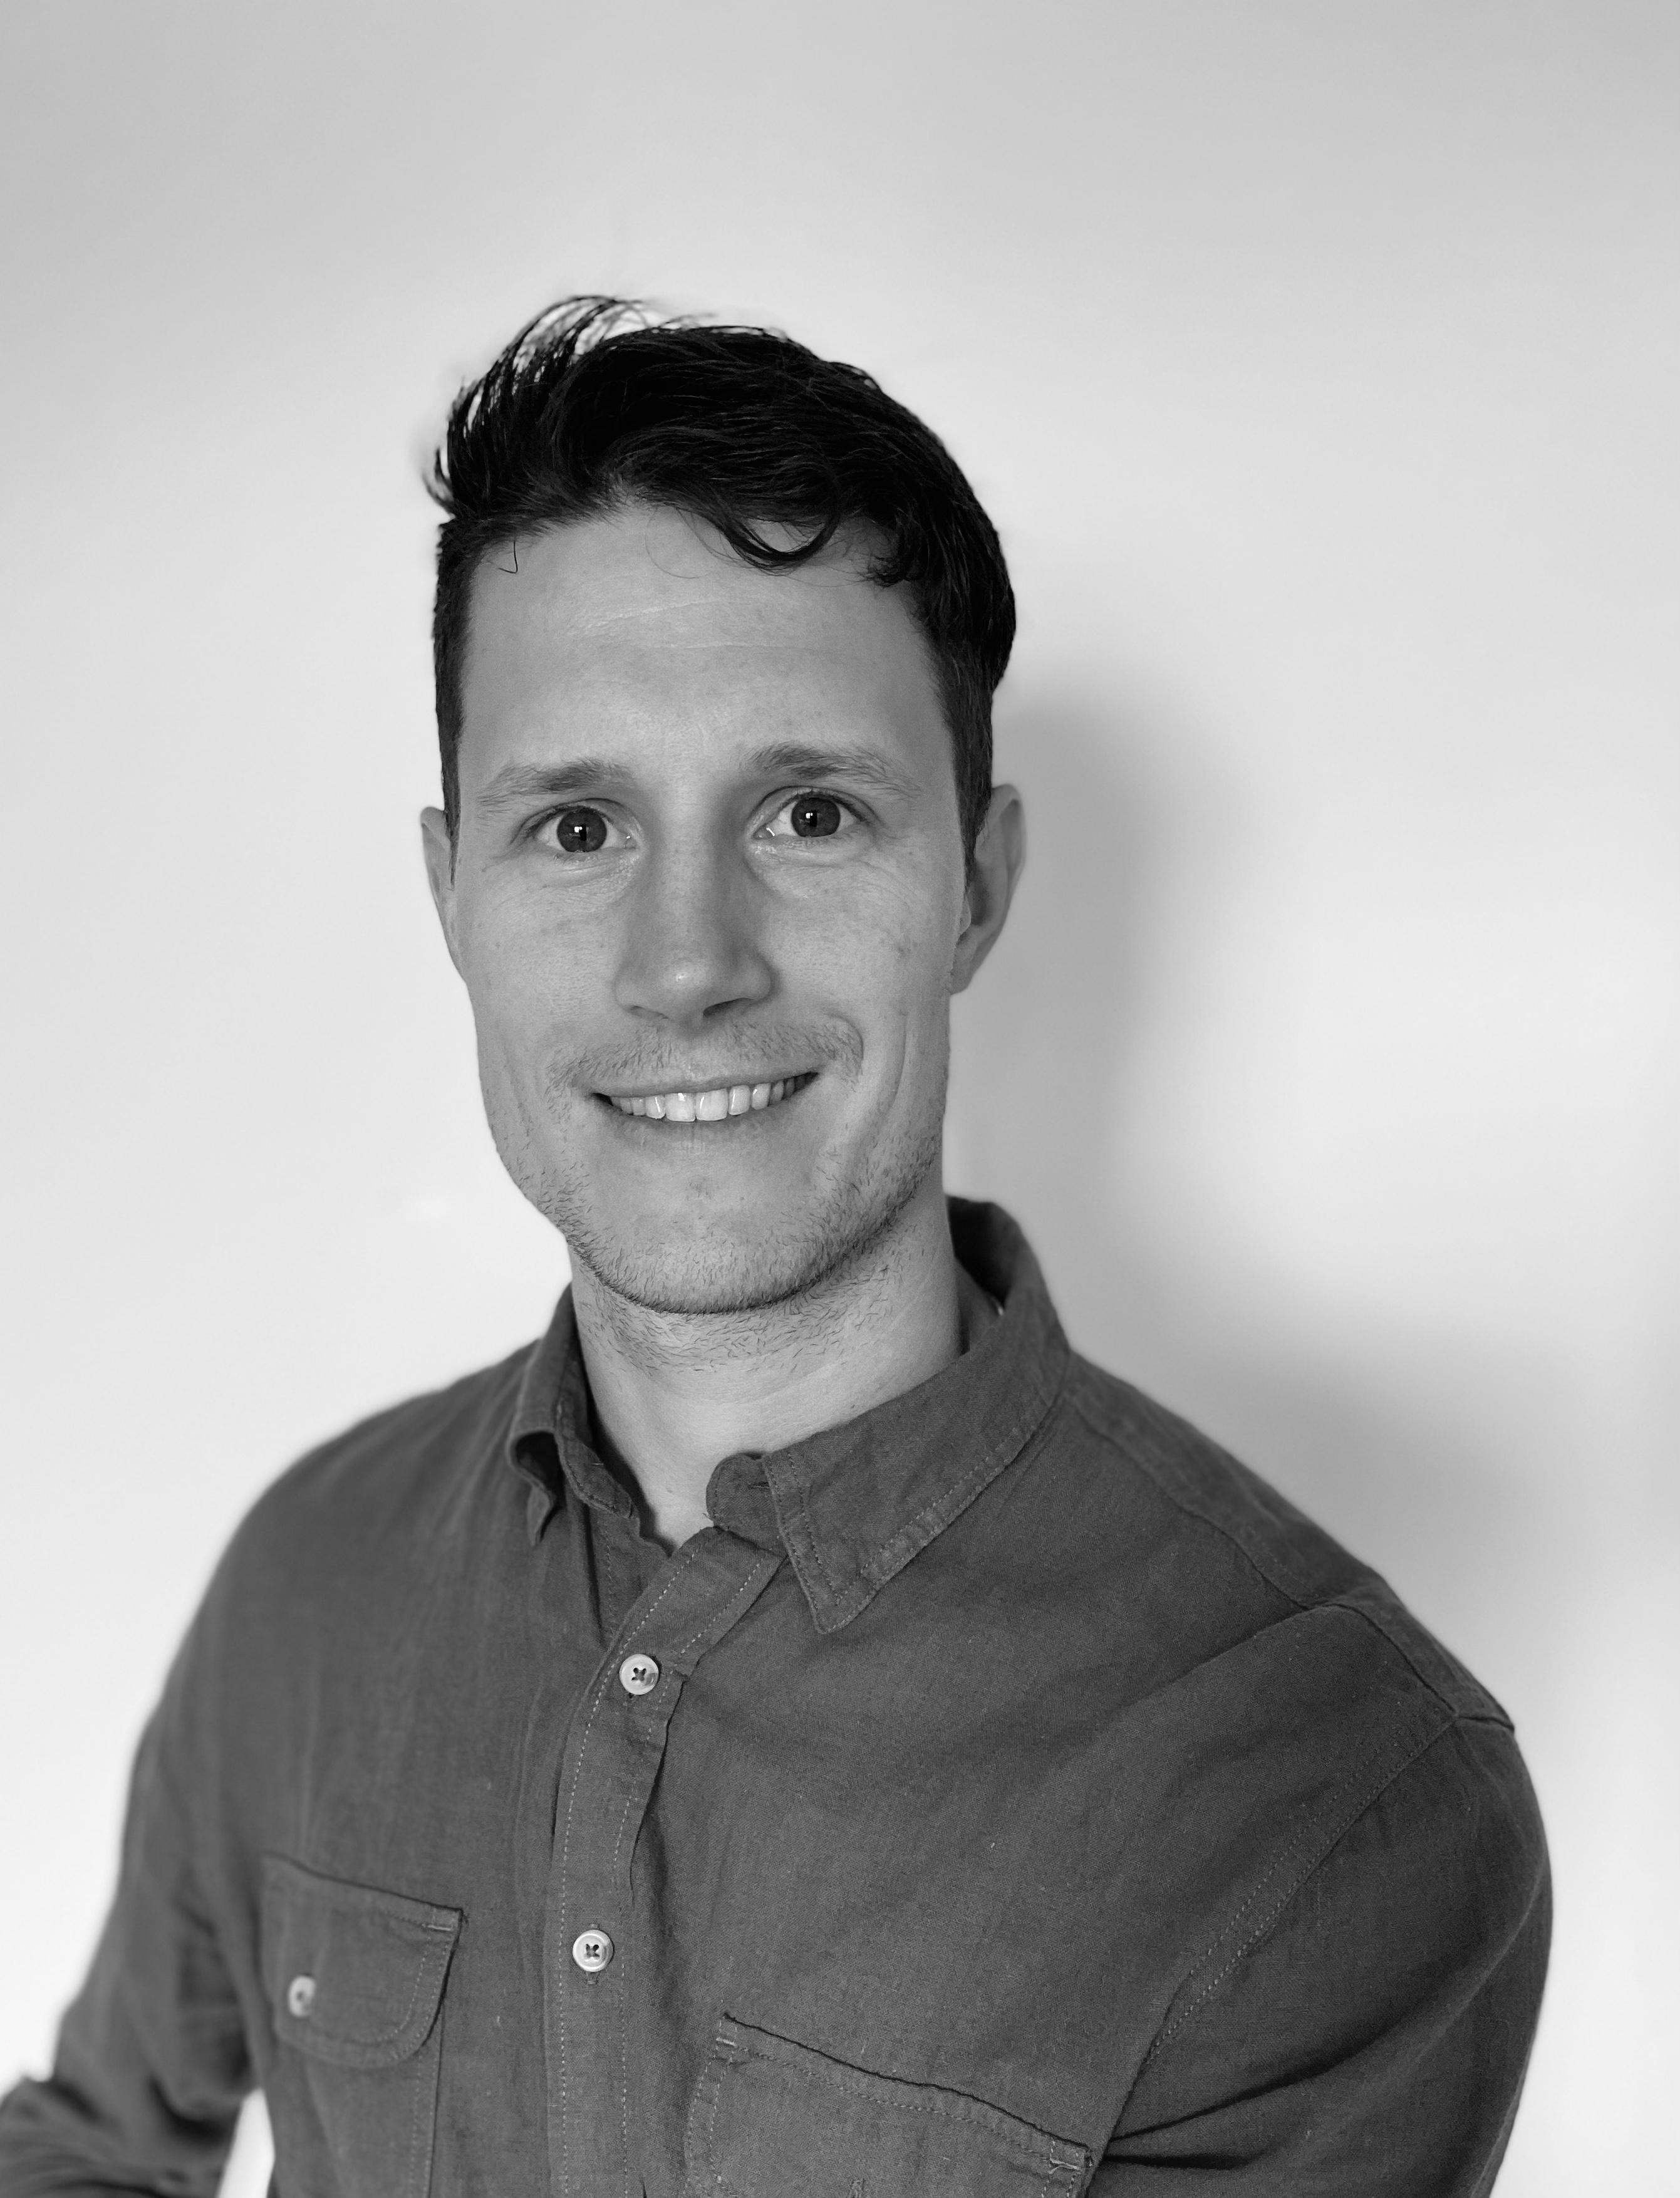 Psykologspesialist Stian Sørheim Espevoll